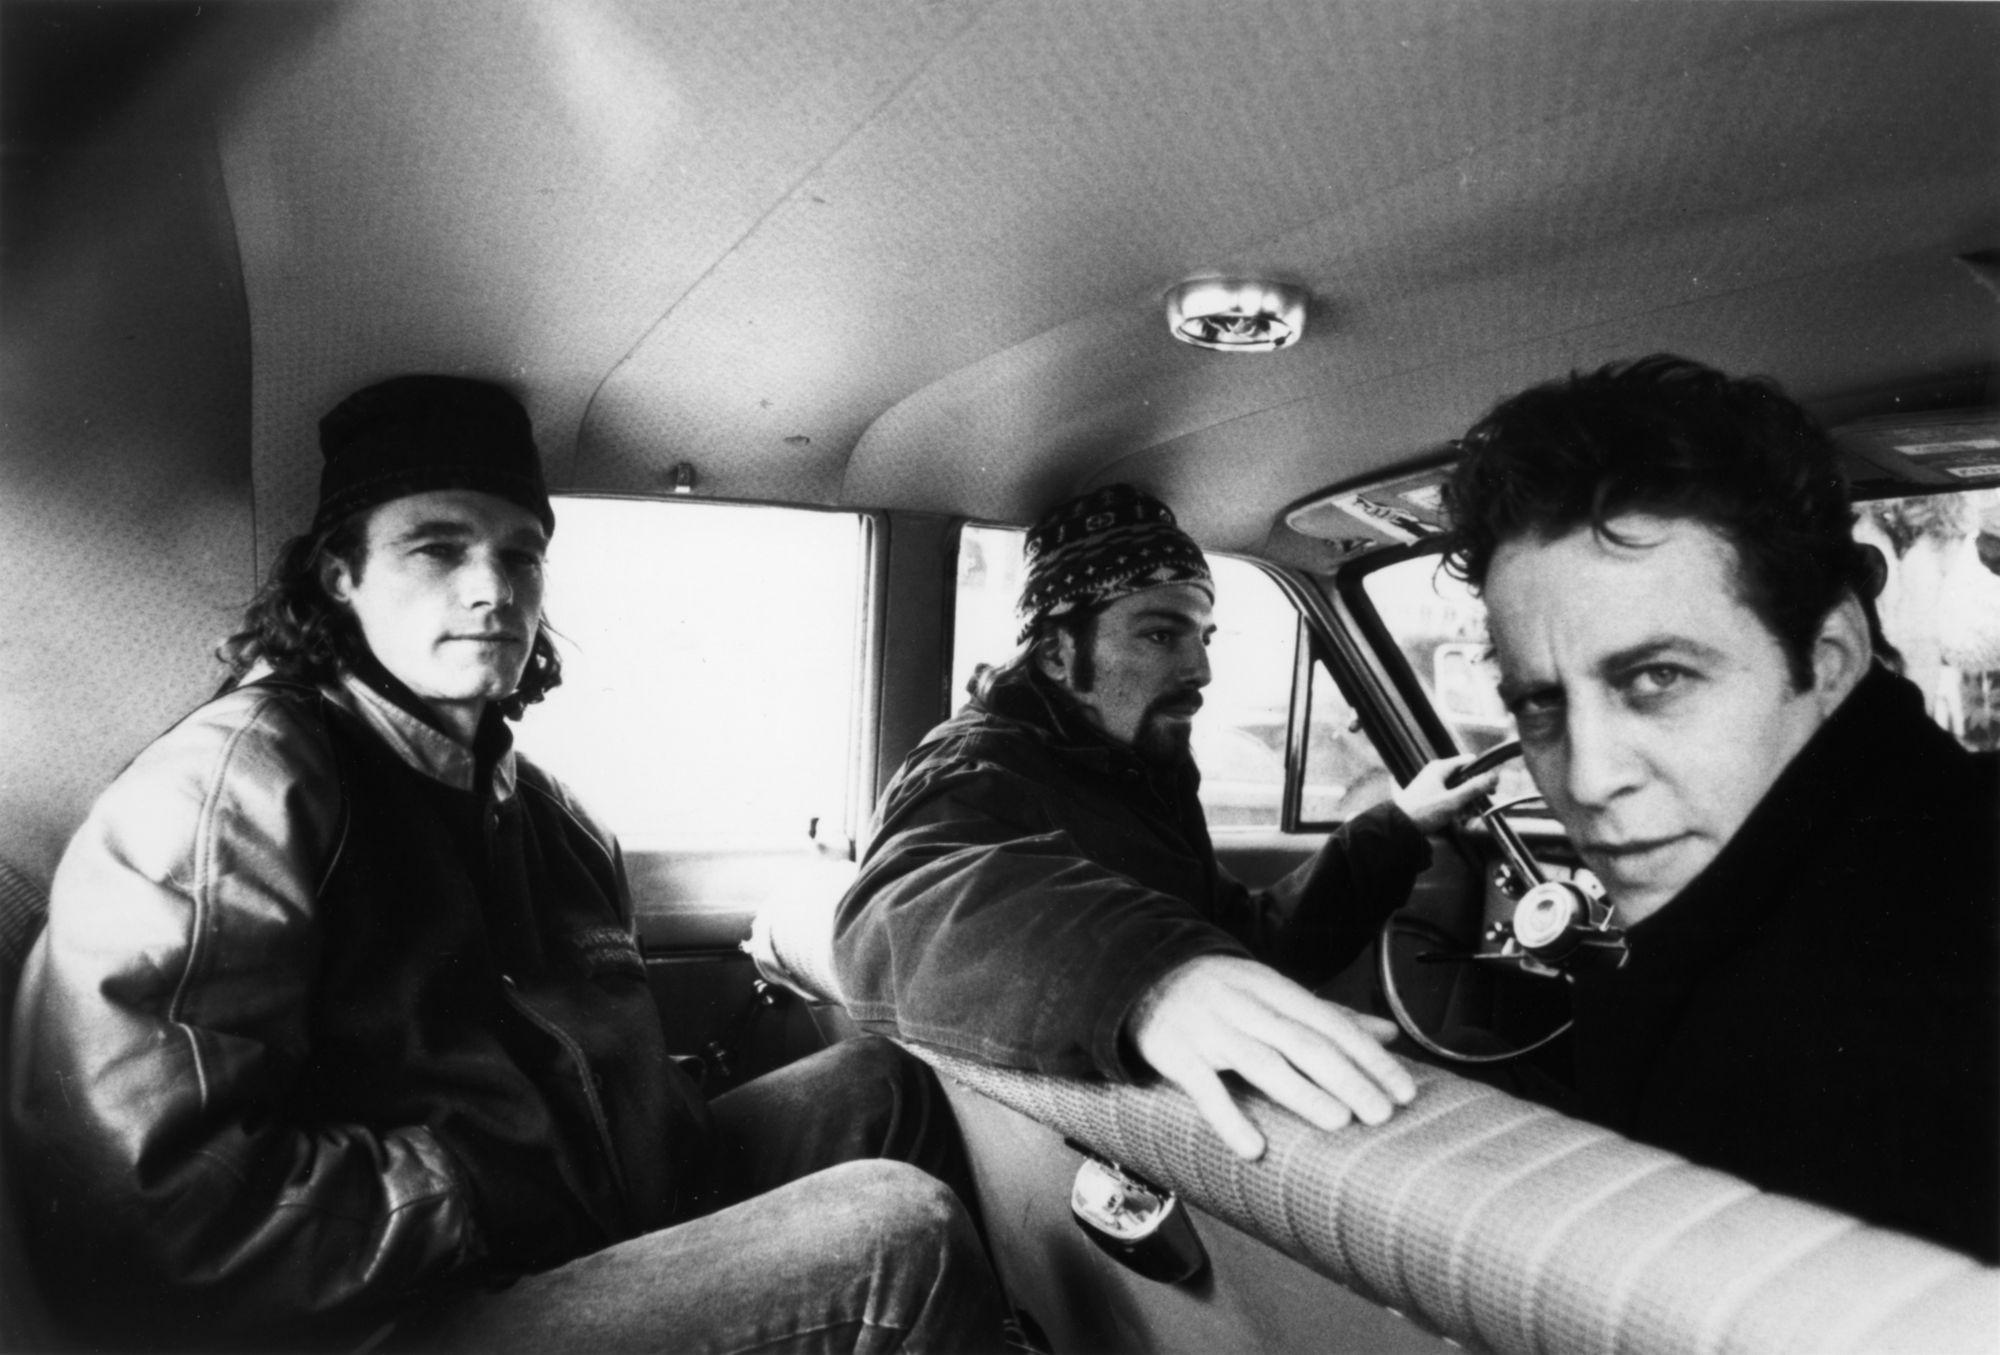 MArk Sandman com a banda Morphine